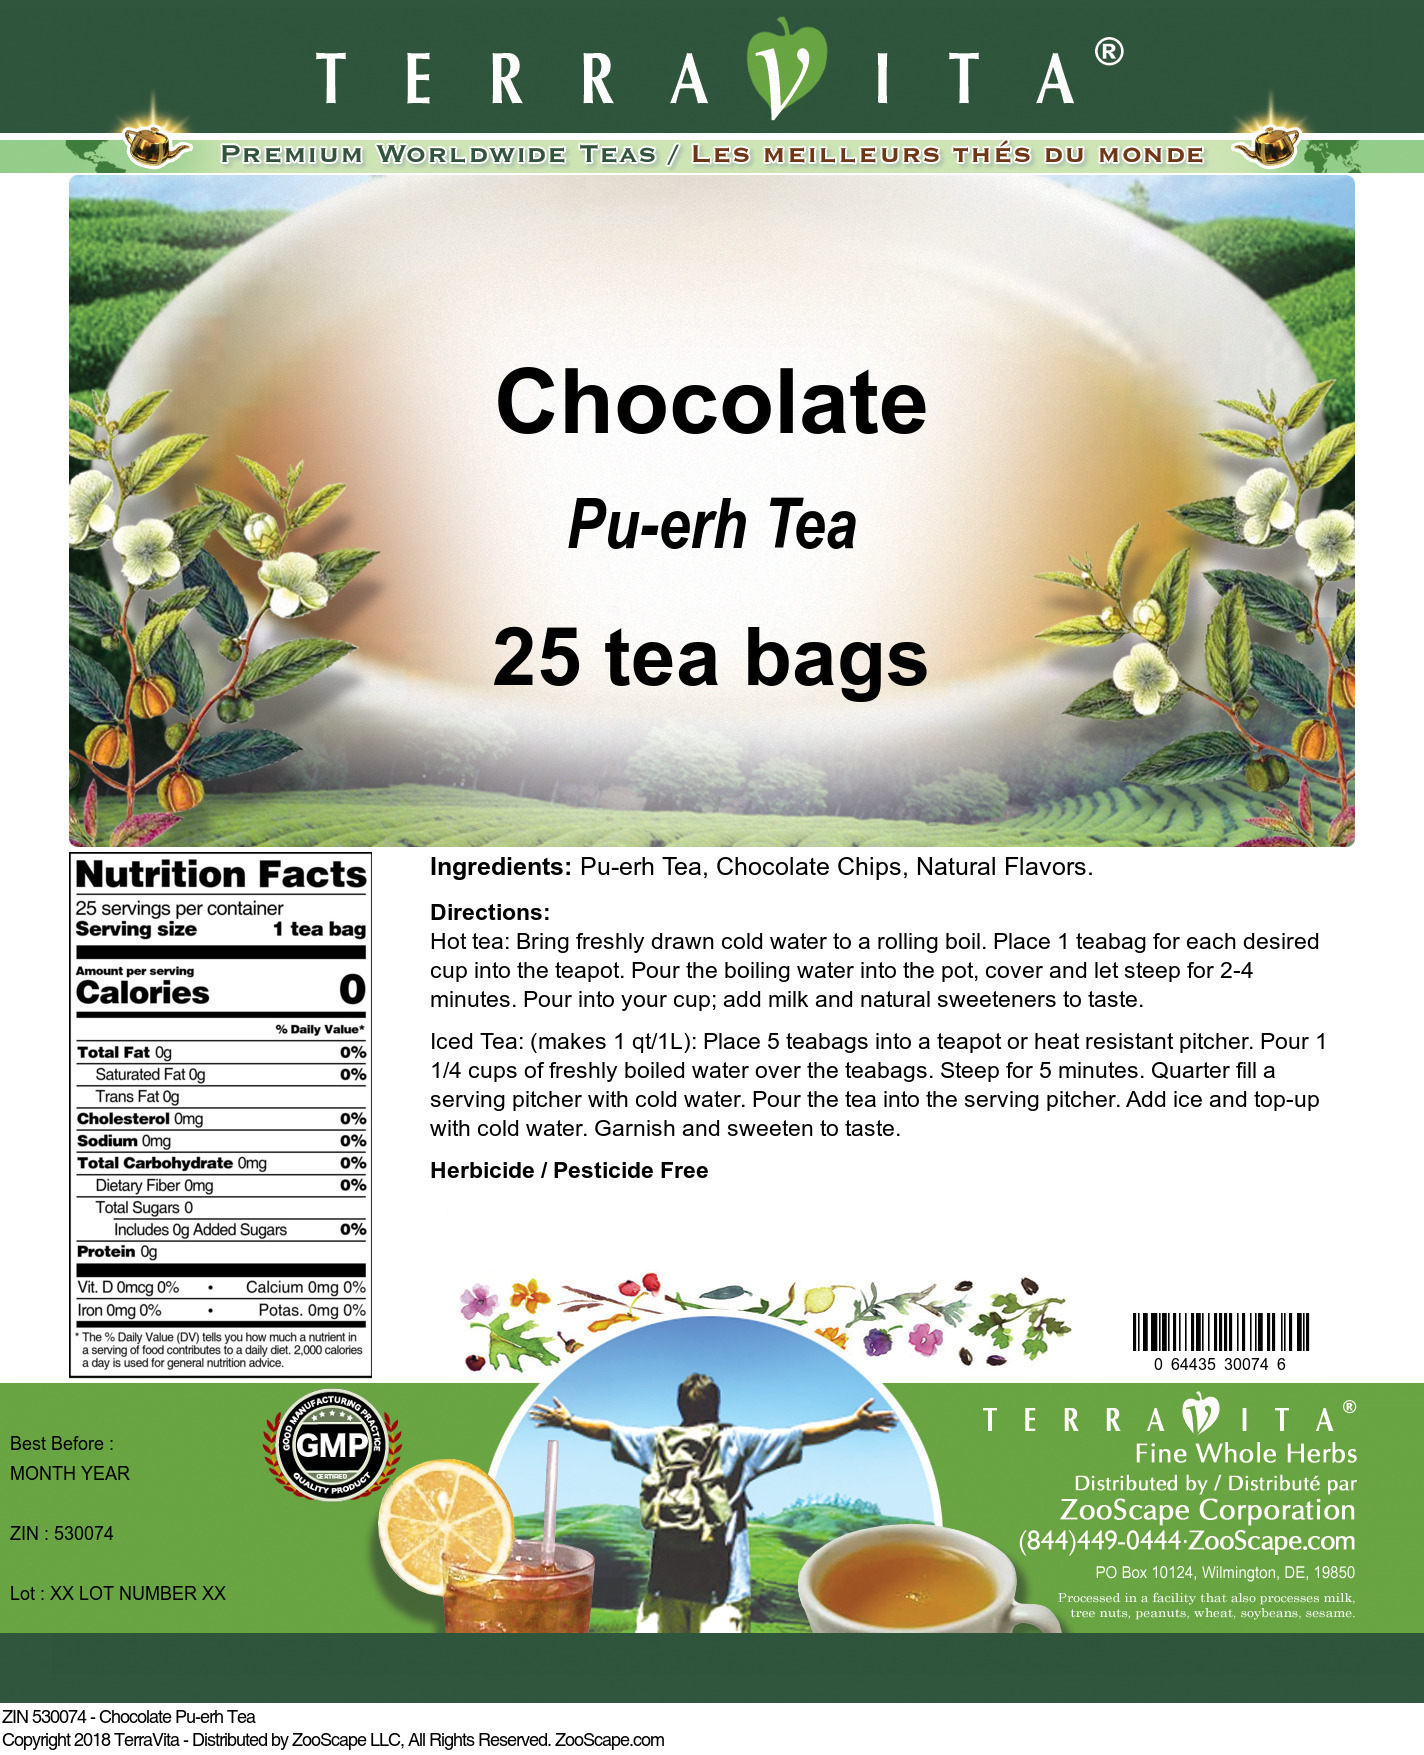 Chocolate Pu-erh Tea